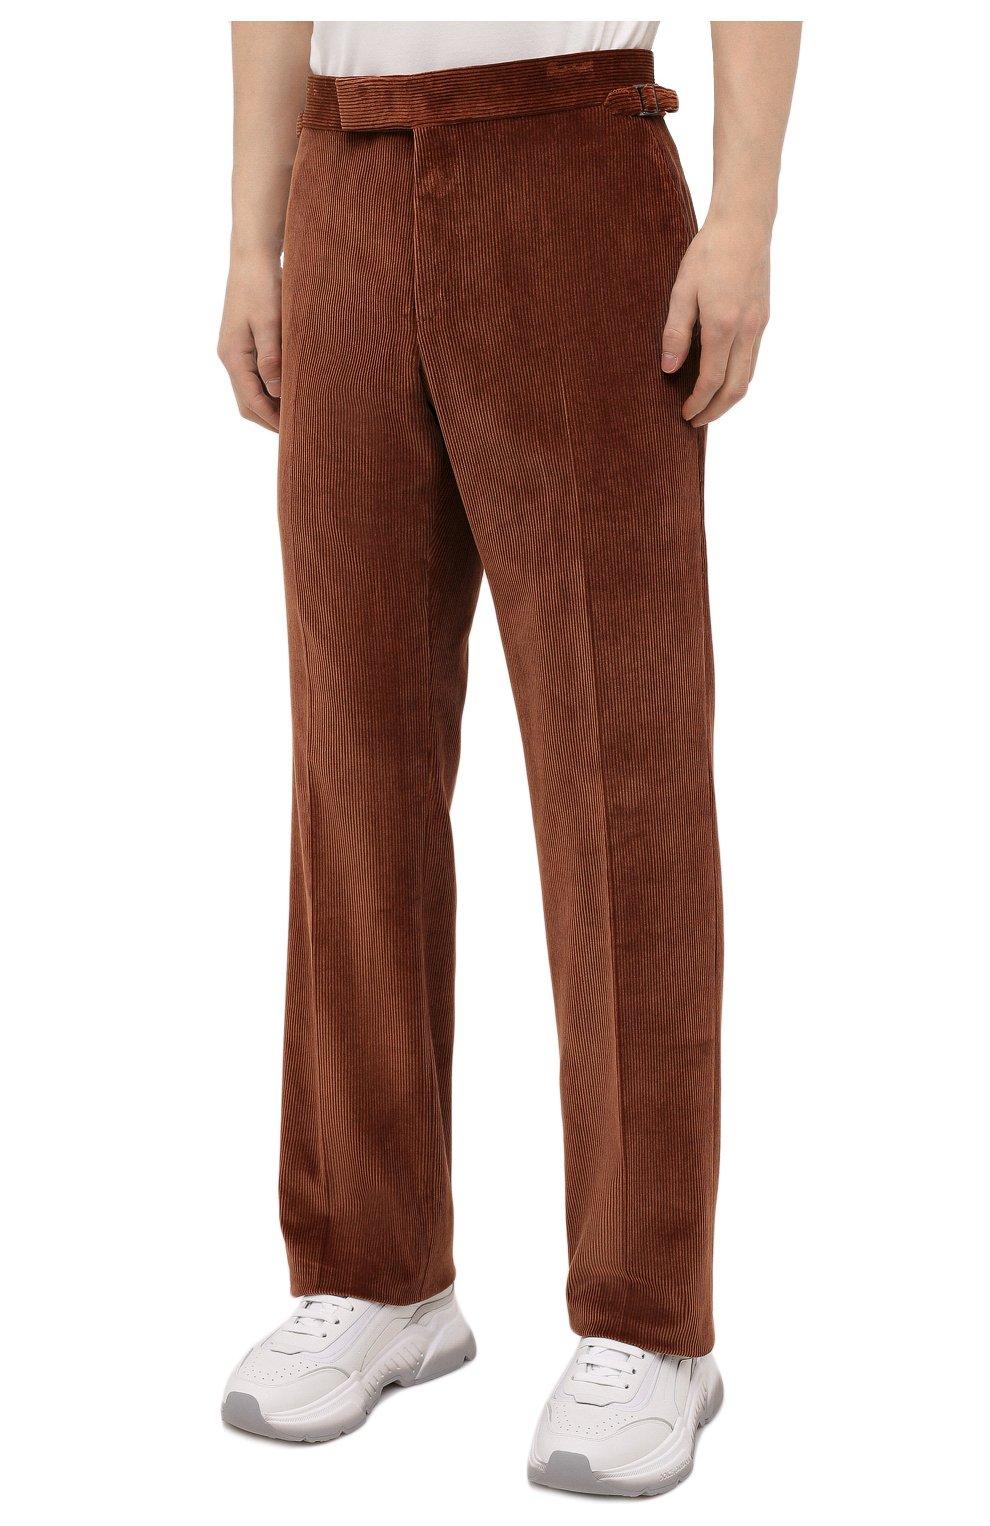 Мужские брюки TOM FORD коричневого цвета, арт. 2VER24/610041 | Фото 3